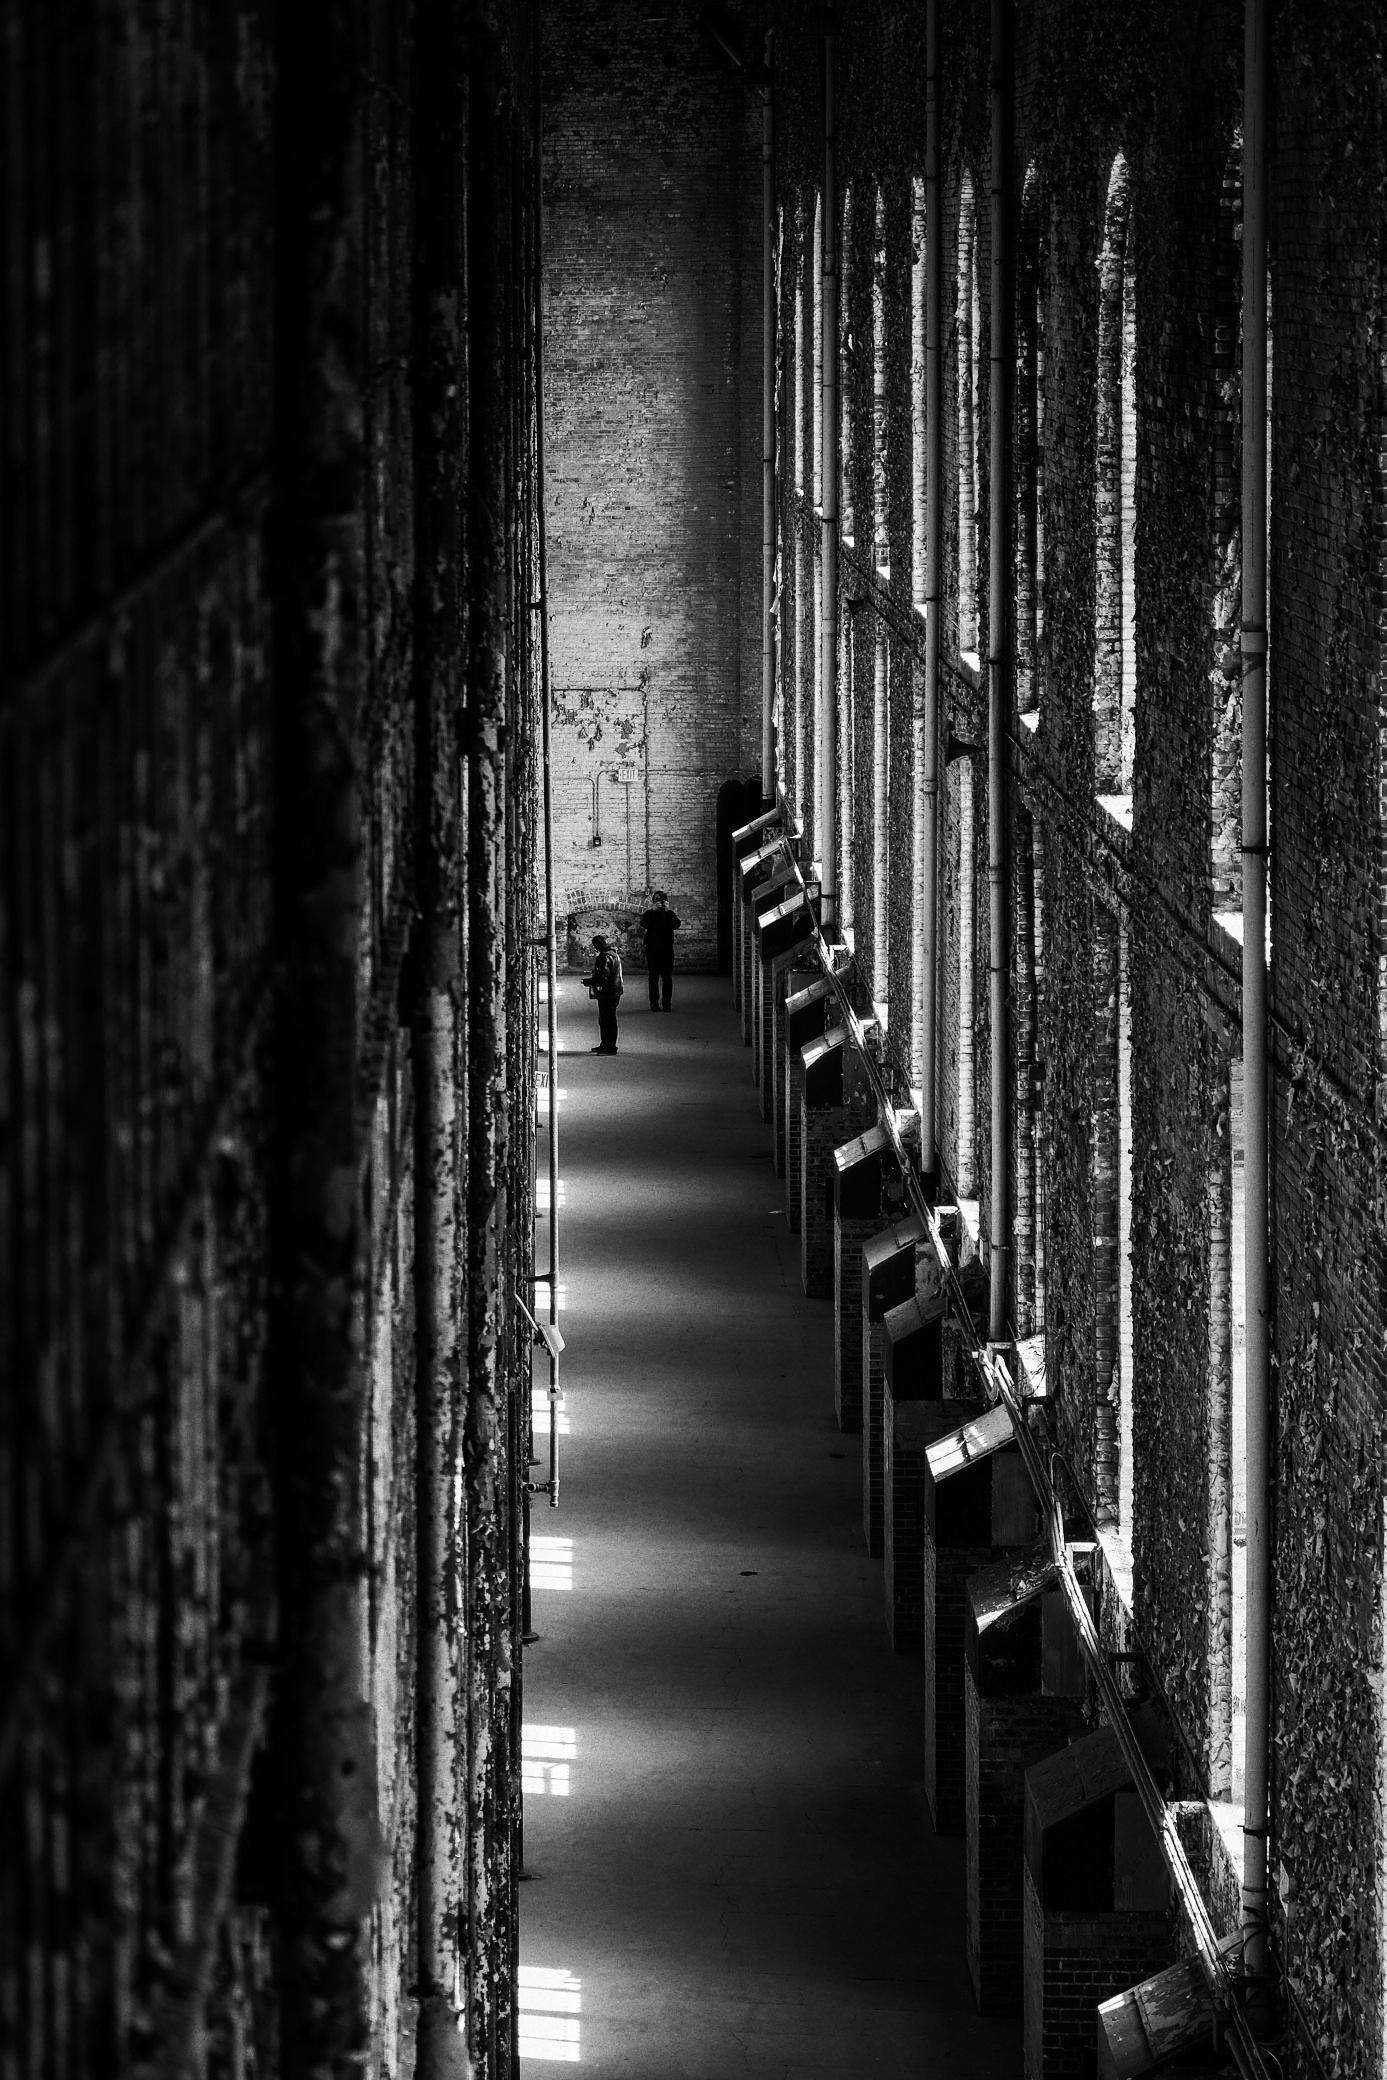 Ohio State Reformatory in Mansfield Ohio  (image heavy)